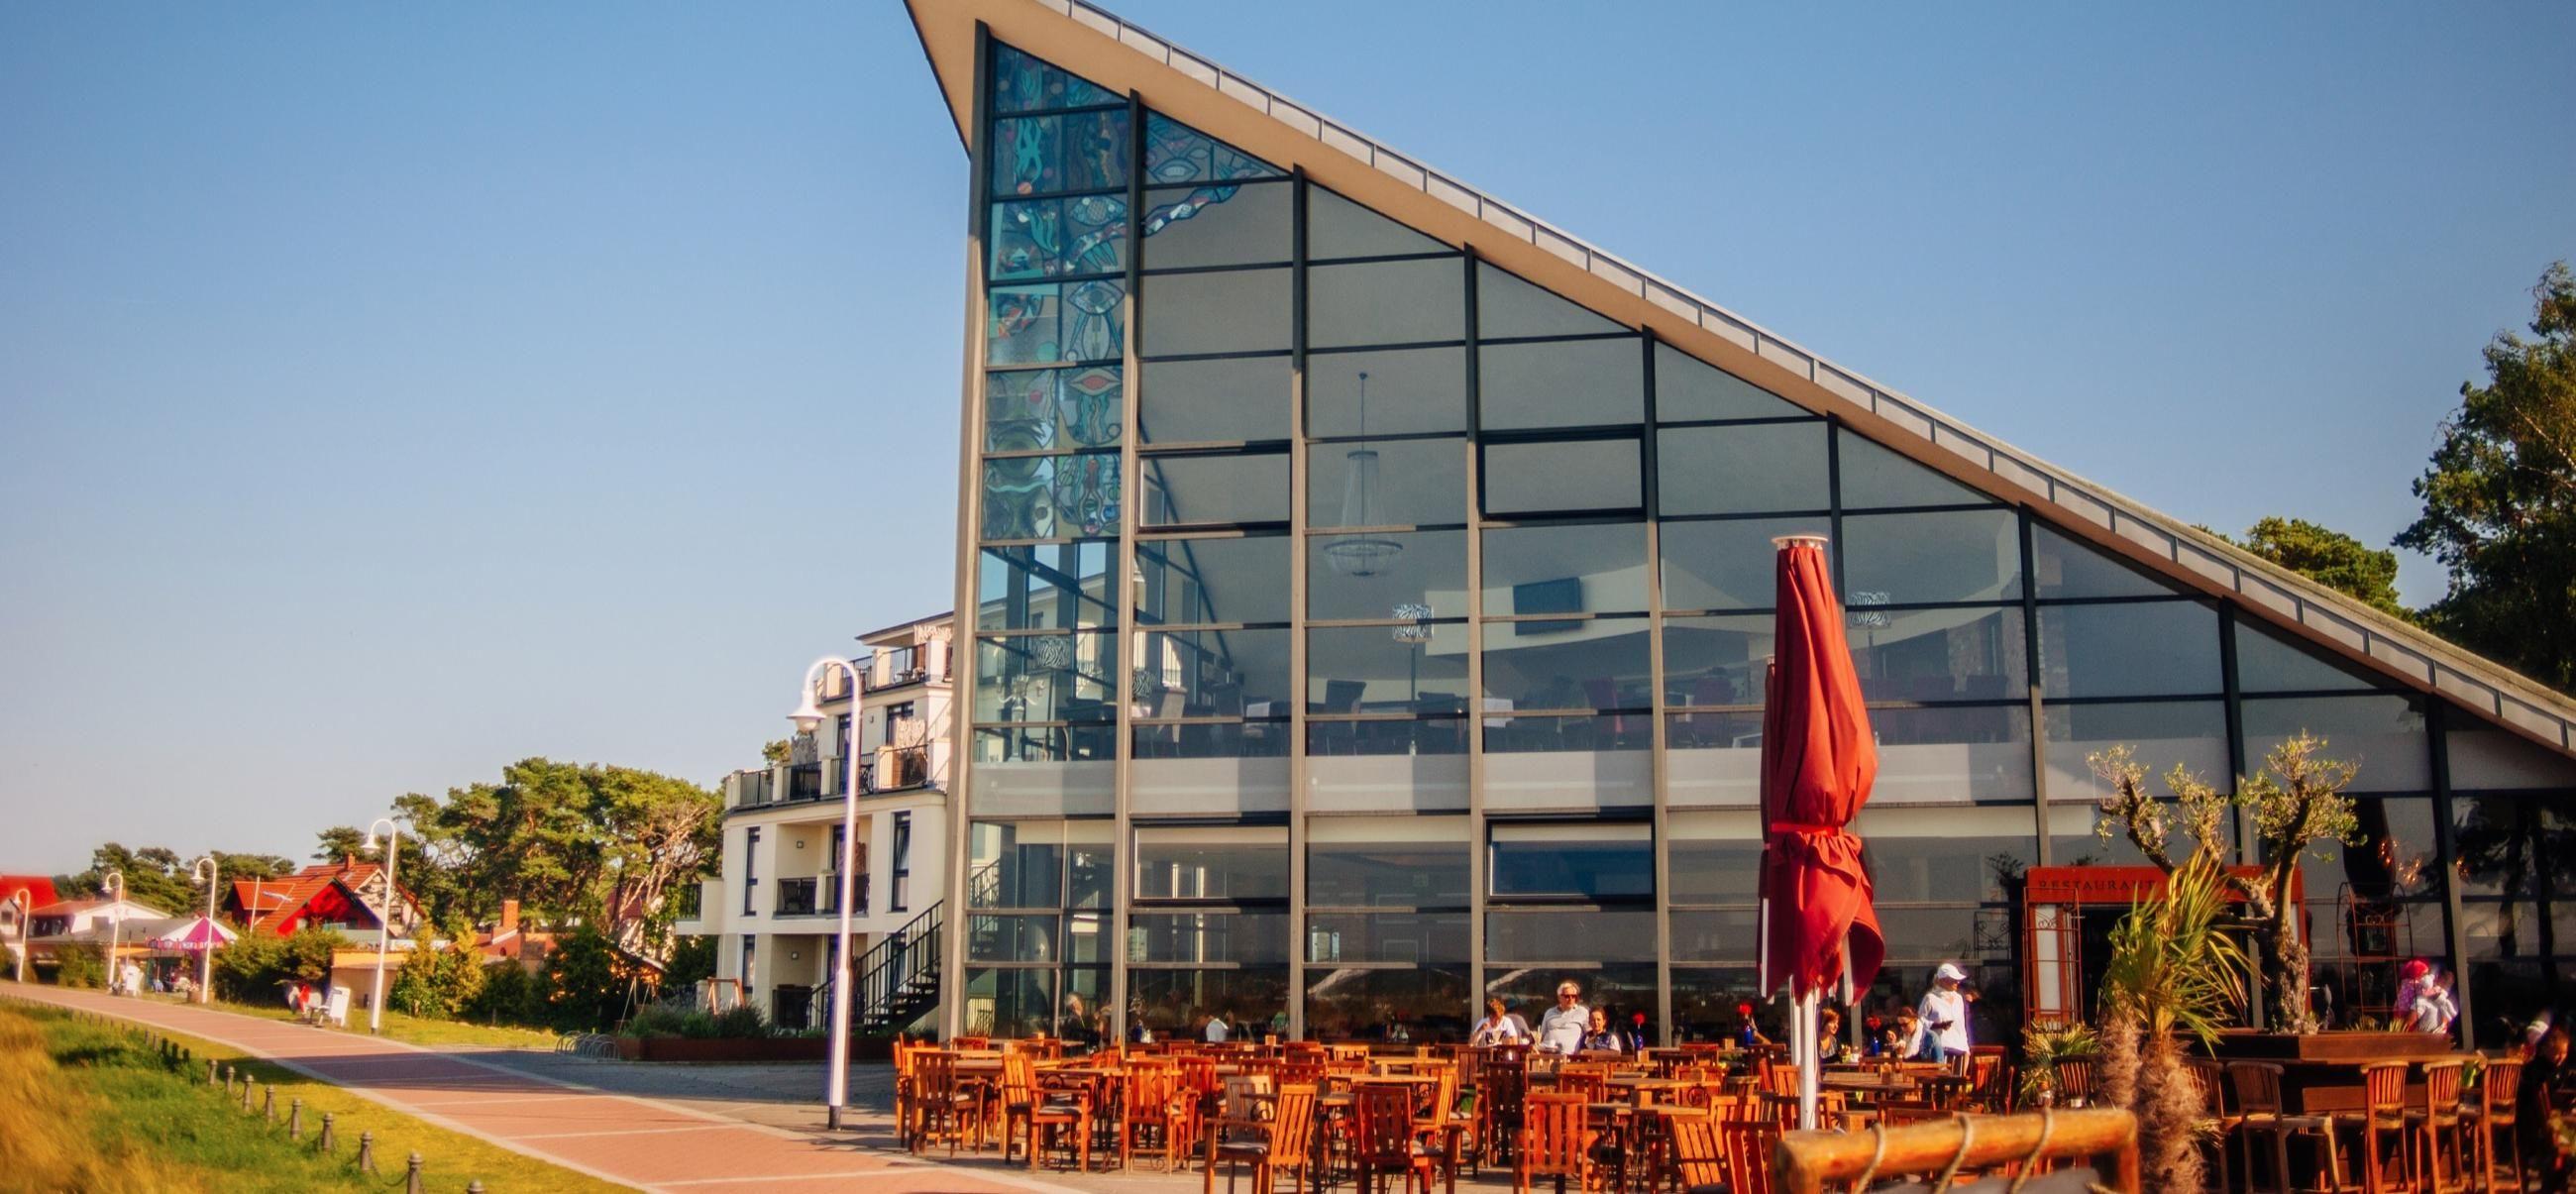 Glowe: Insel Rügen - Urlaub, Sehenswürdigkeiten, Hotels ...  Glowe: Insel R�...